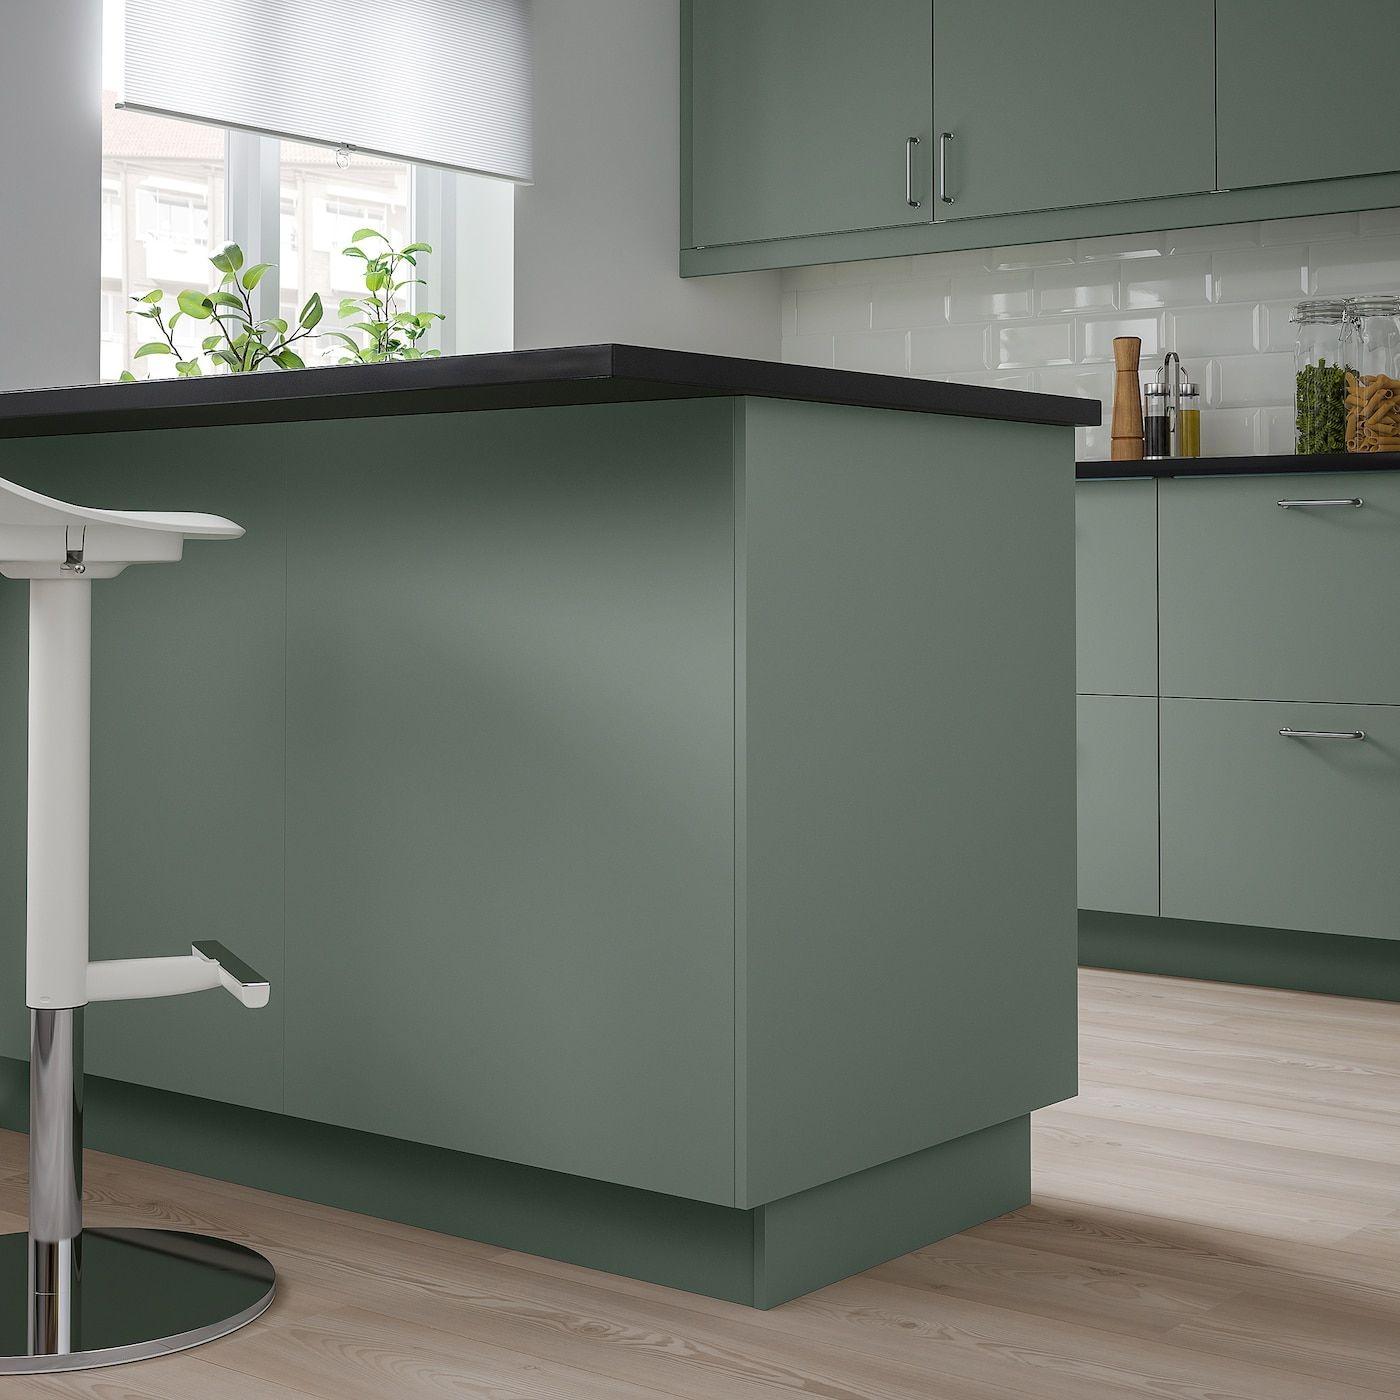 Bodarp Cover Panel Gray Green Ikea In 2020 Ikea Kitchen Design Cottage Kitchen Design Green Kitchen Cabinets